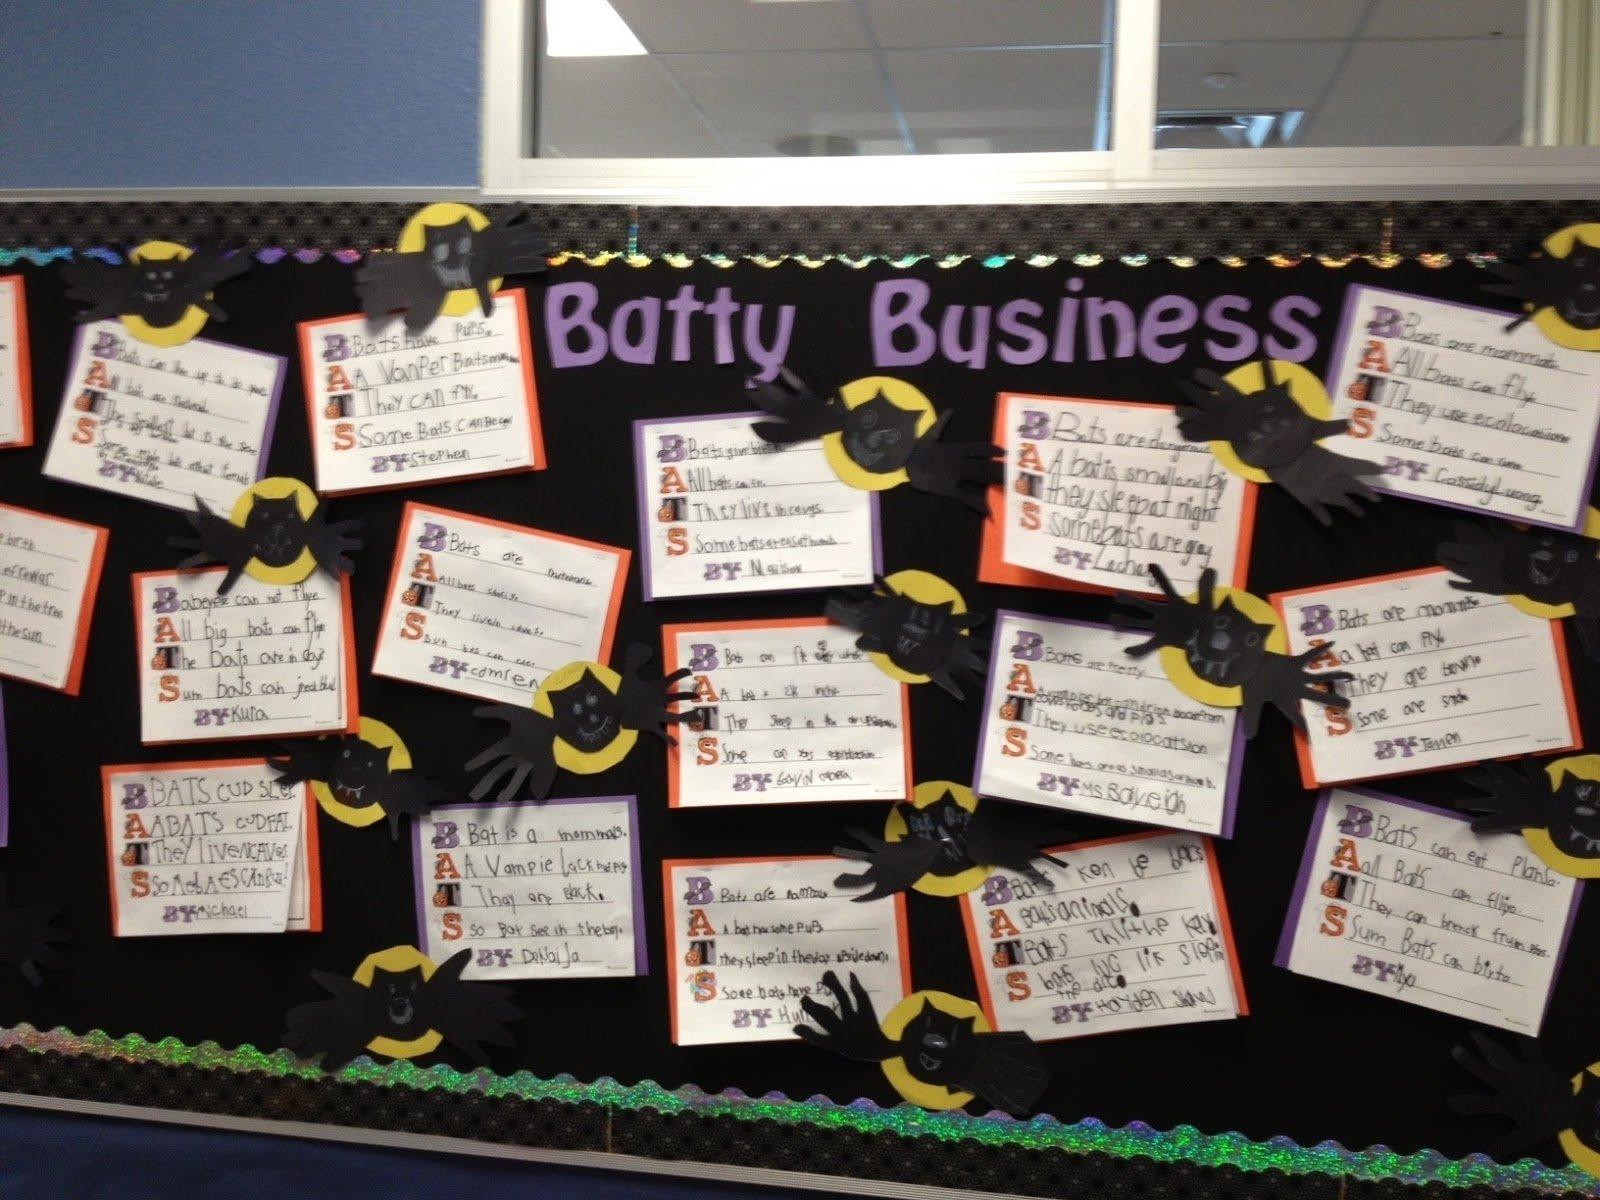 10 Fantastic Fall Halloween Bulletin Board Ideas batty business halloween bulletin board idea myclassroomideas 2020